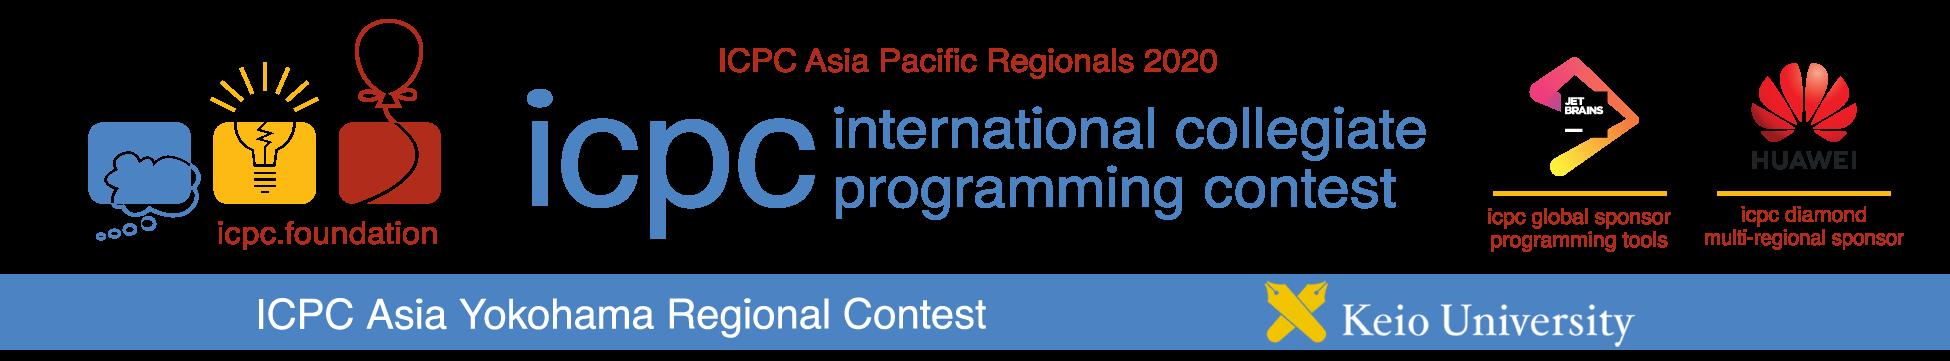 ICPC 2020 Asia Yokohama Regional